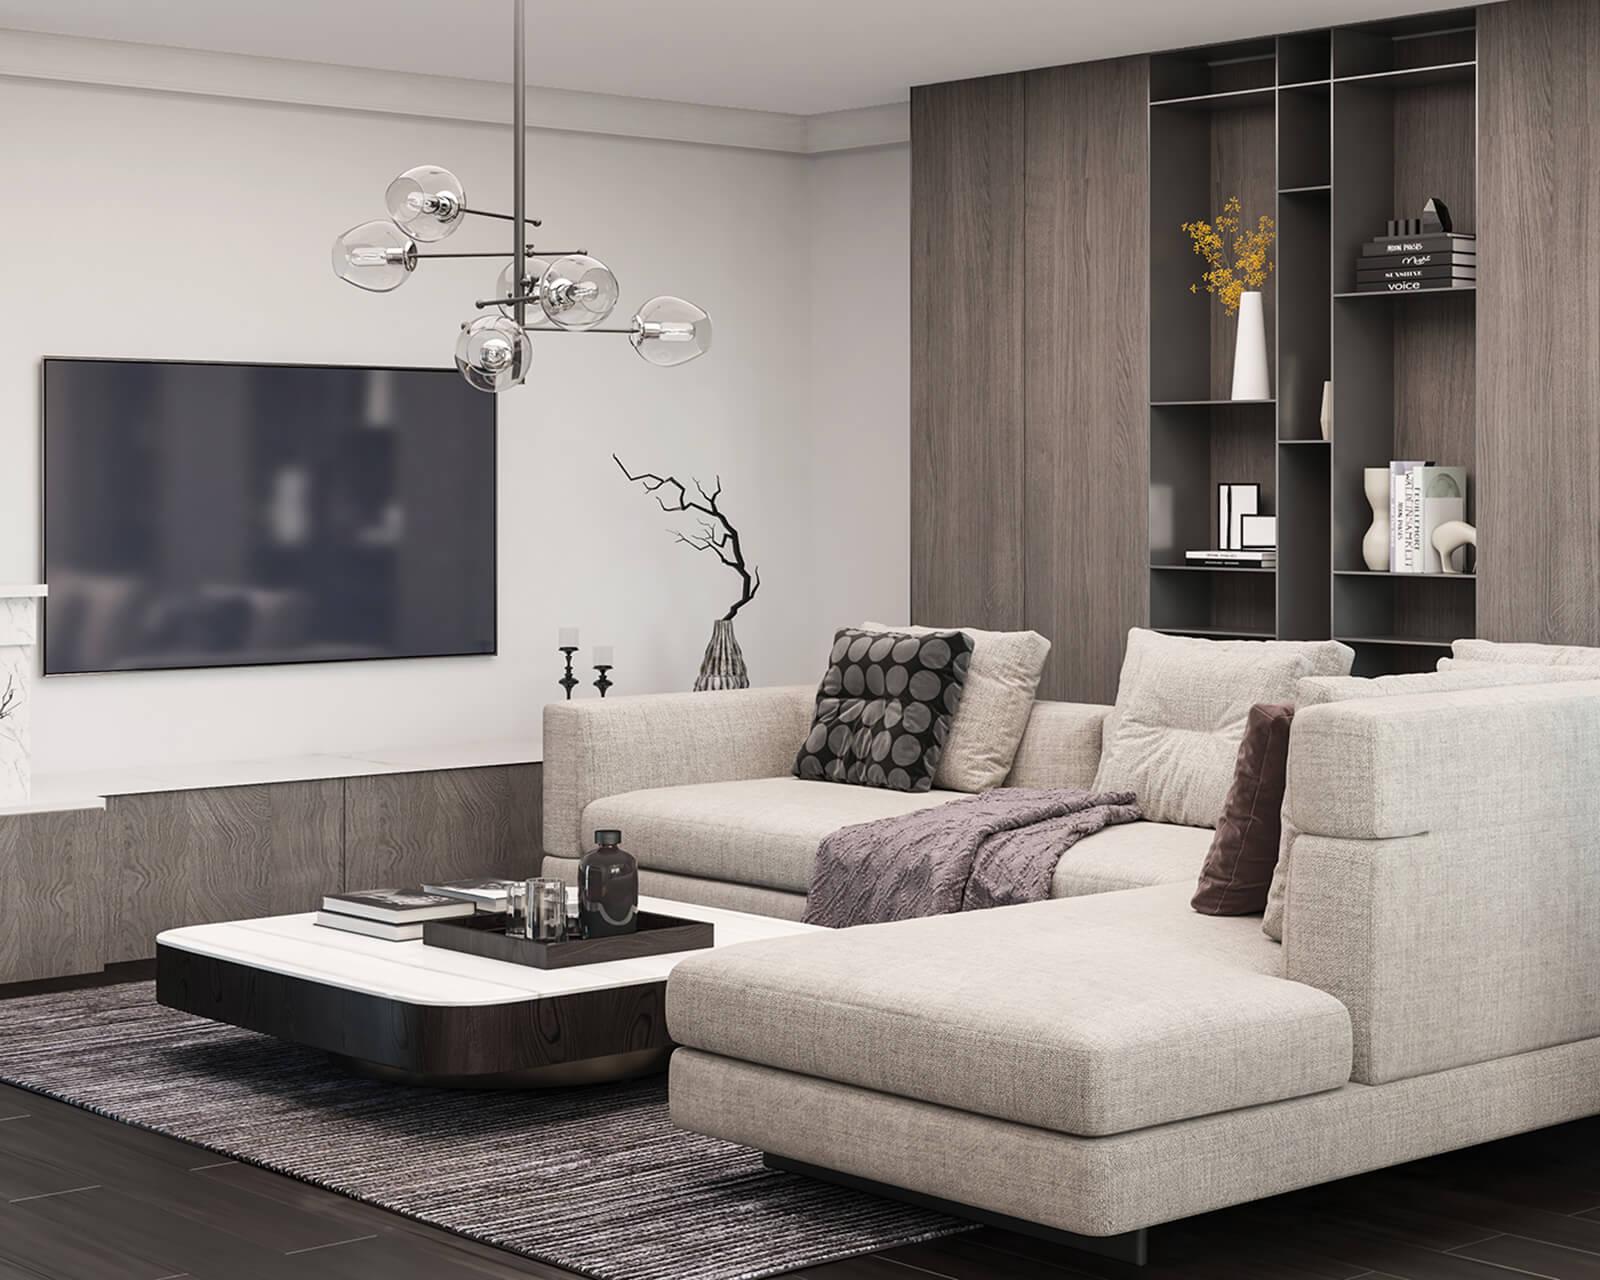 interioren-dizain-proekt-na-vsekidnevna-blu-by-esteta-interiori